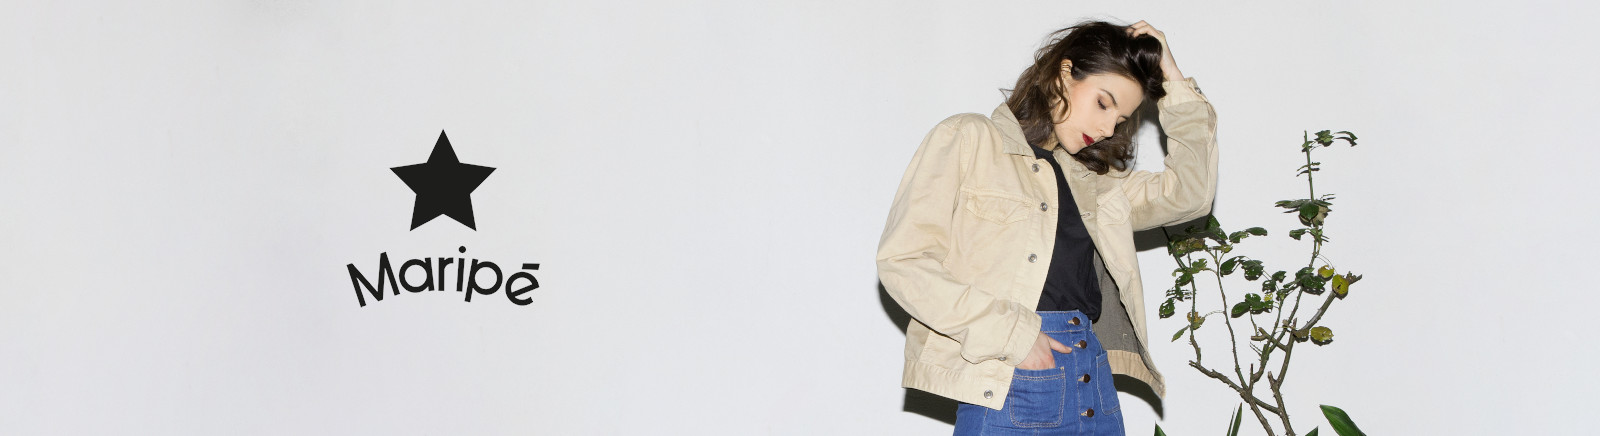 Juppen: Maripé Stiefeletten für Damen online shoppen